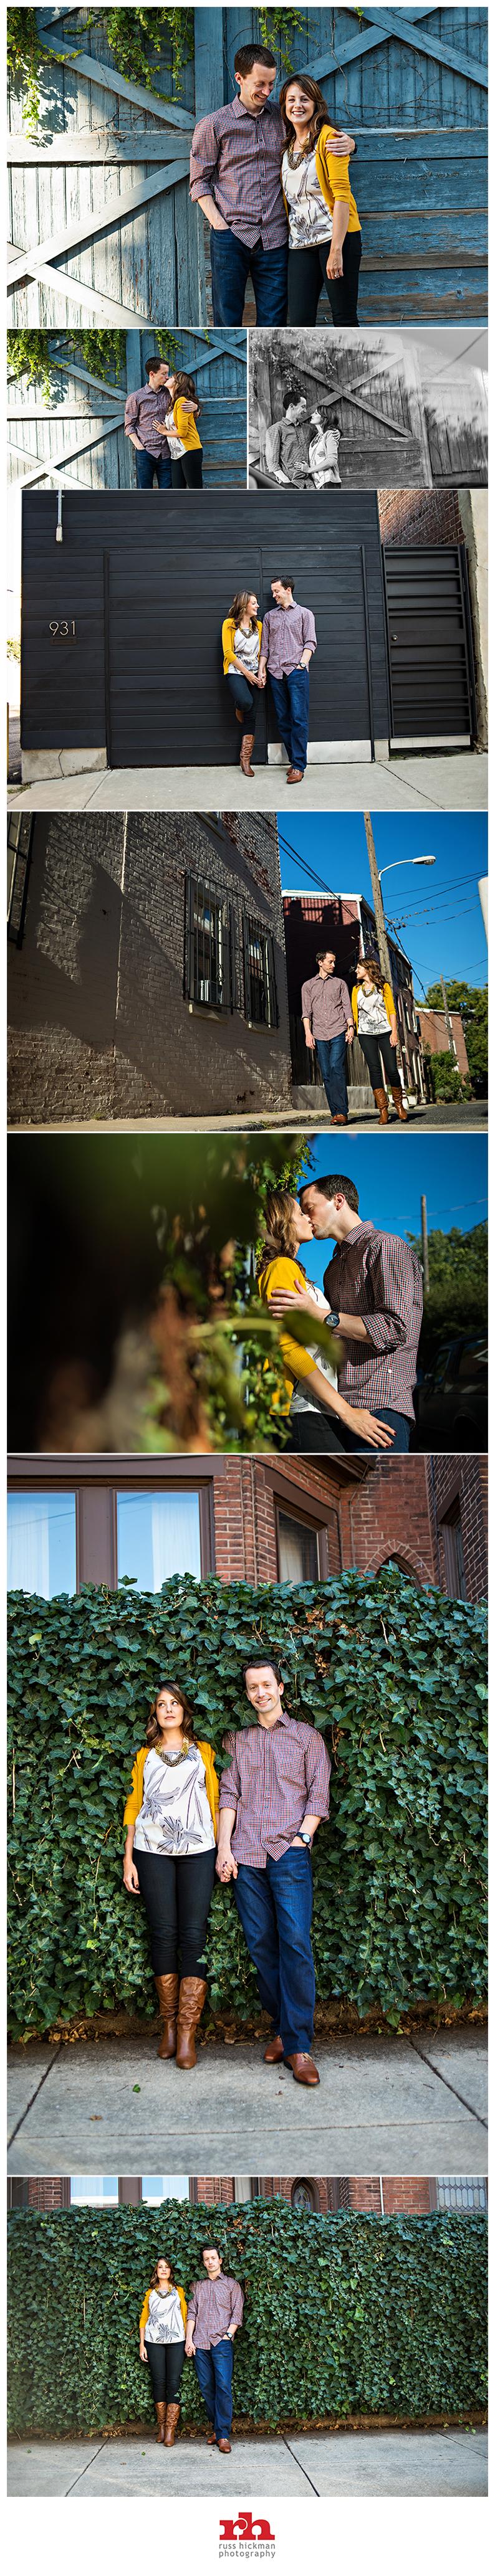 Philadelphia Wedding Photographer AJE03